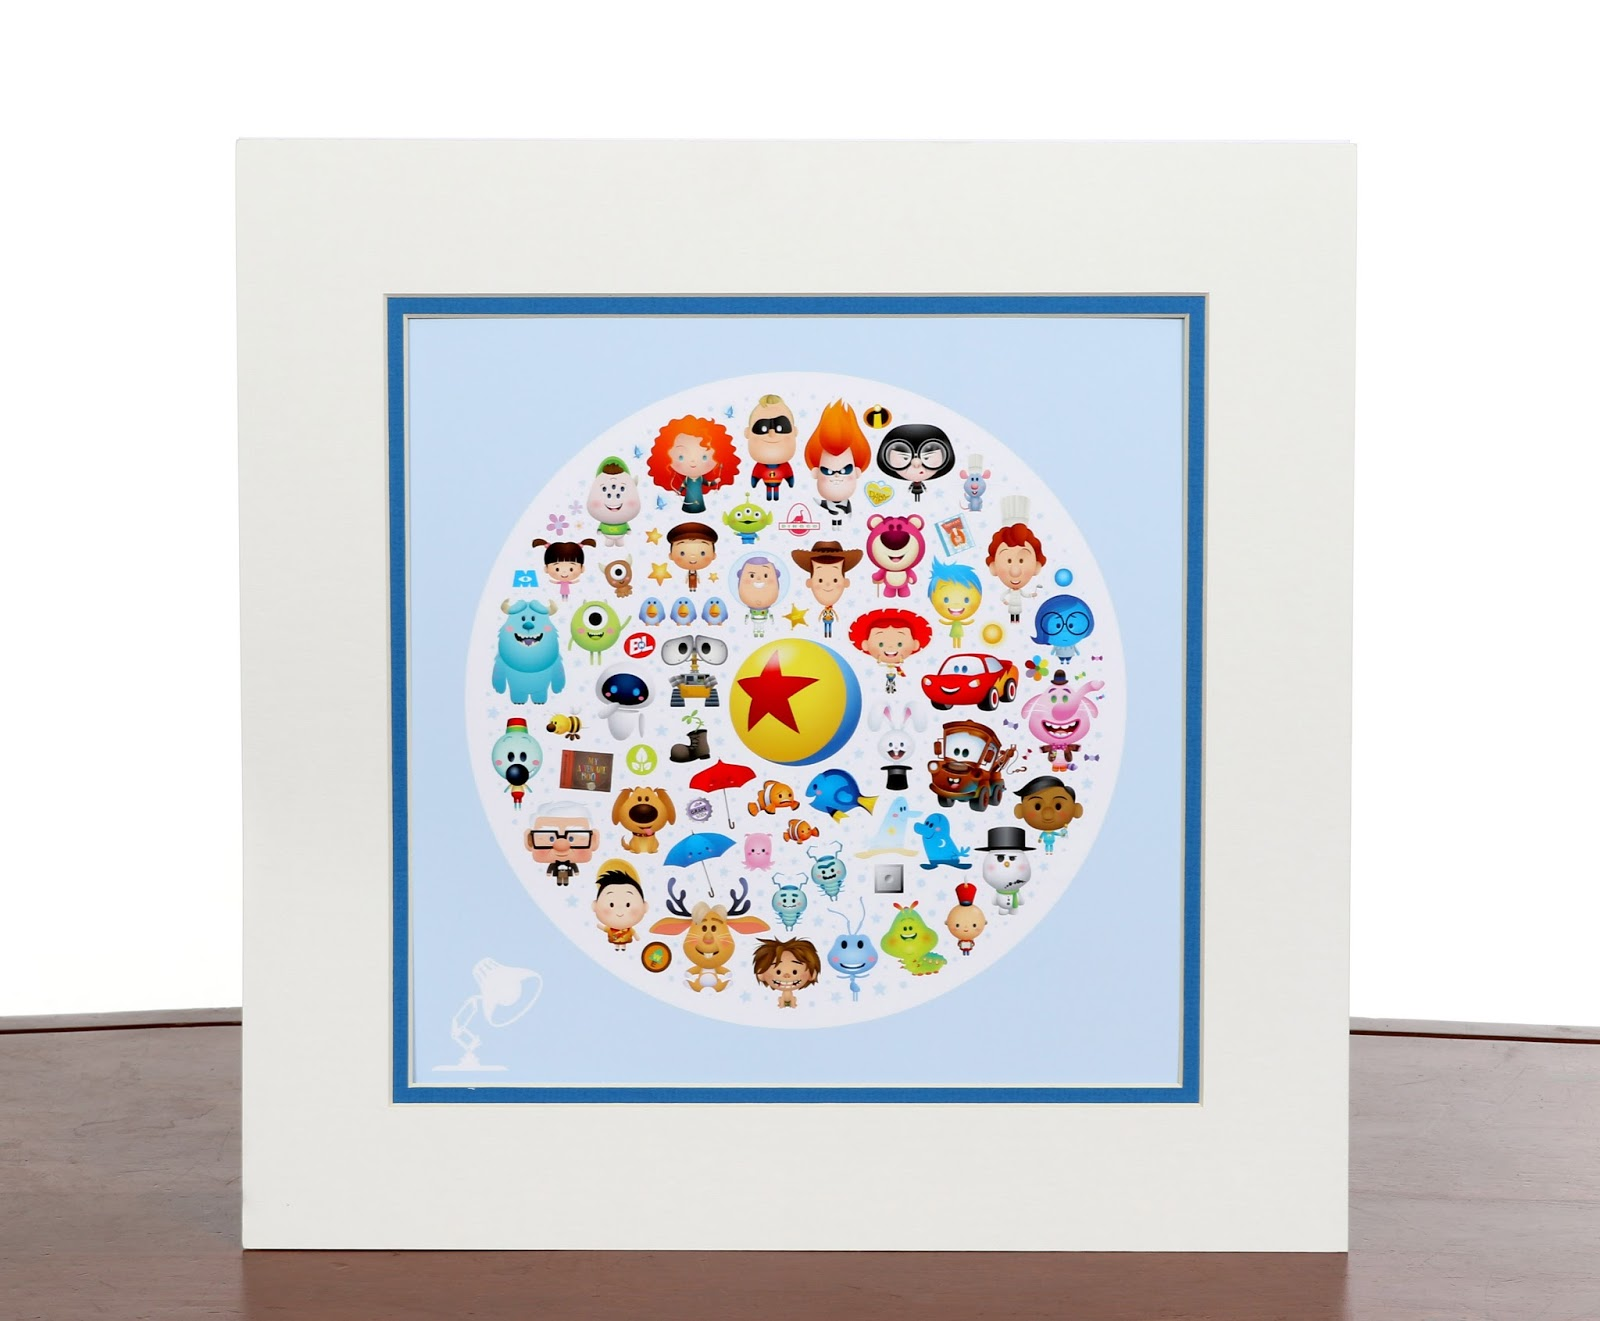 """World of Pixar"" Print by Illustrator Jerrod Maruyama"